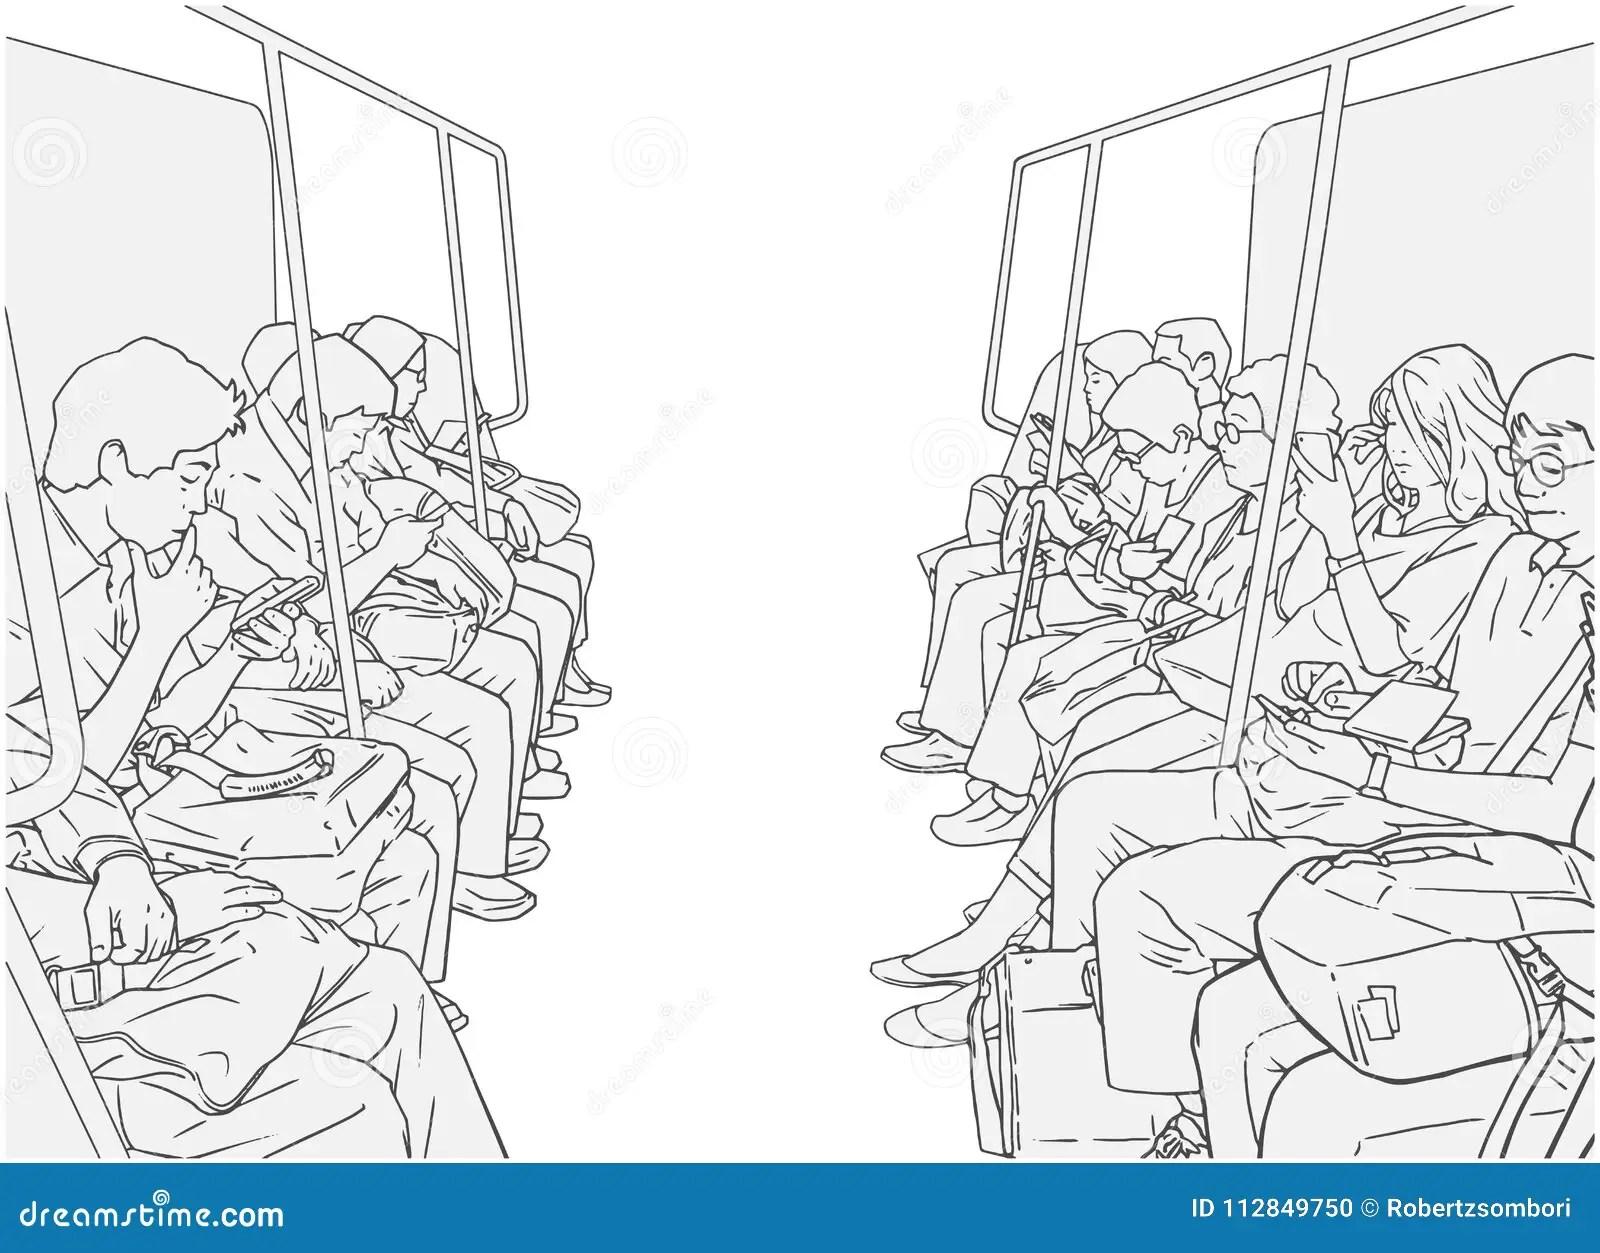 Illustration Of People Using Public Transport Train